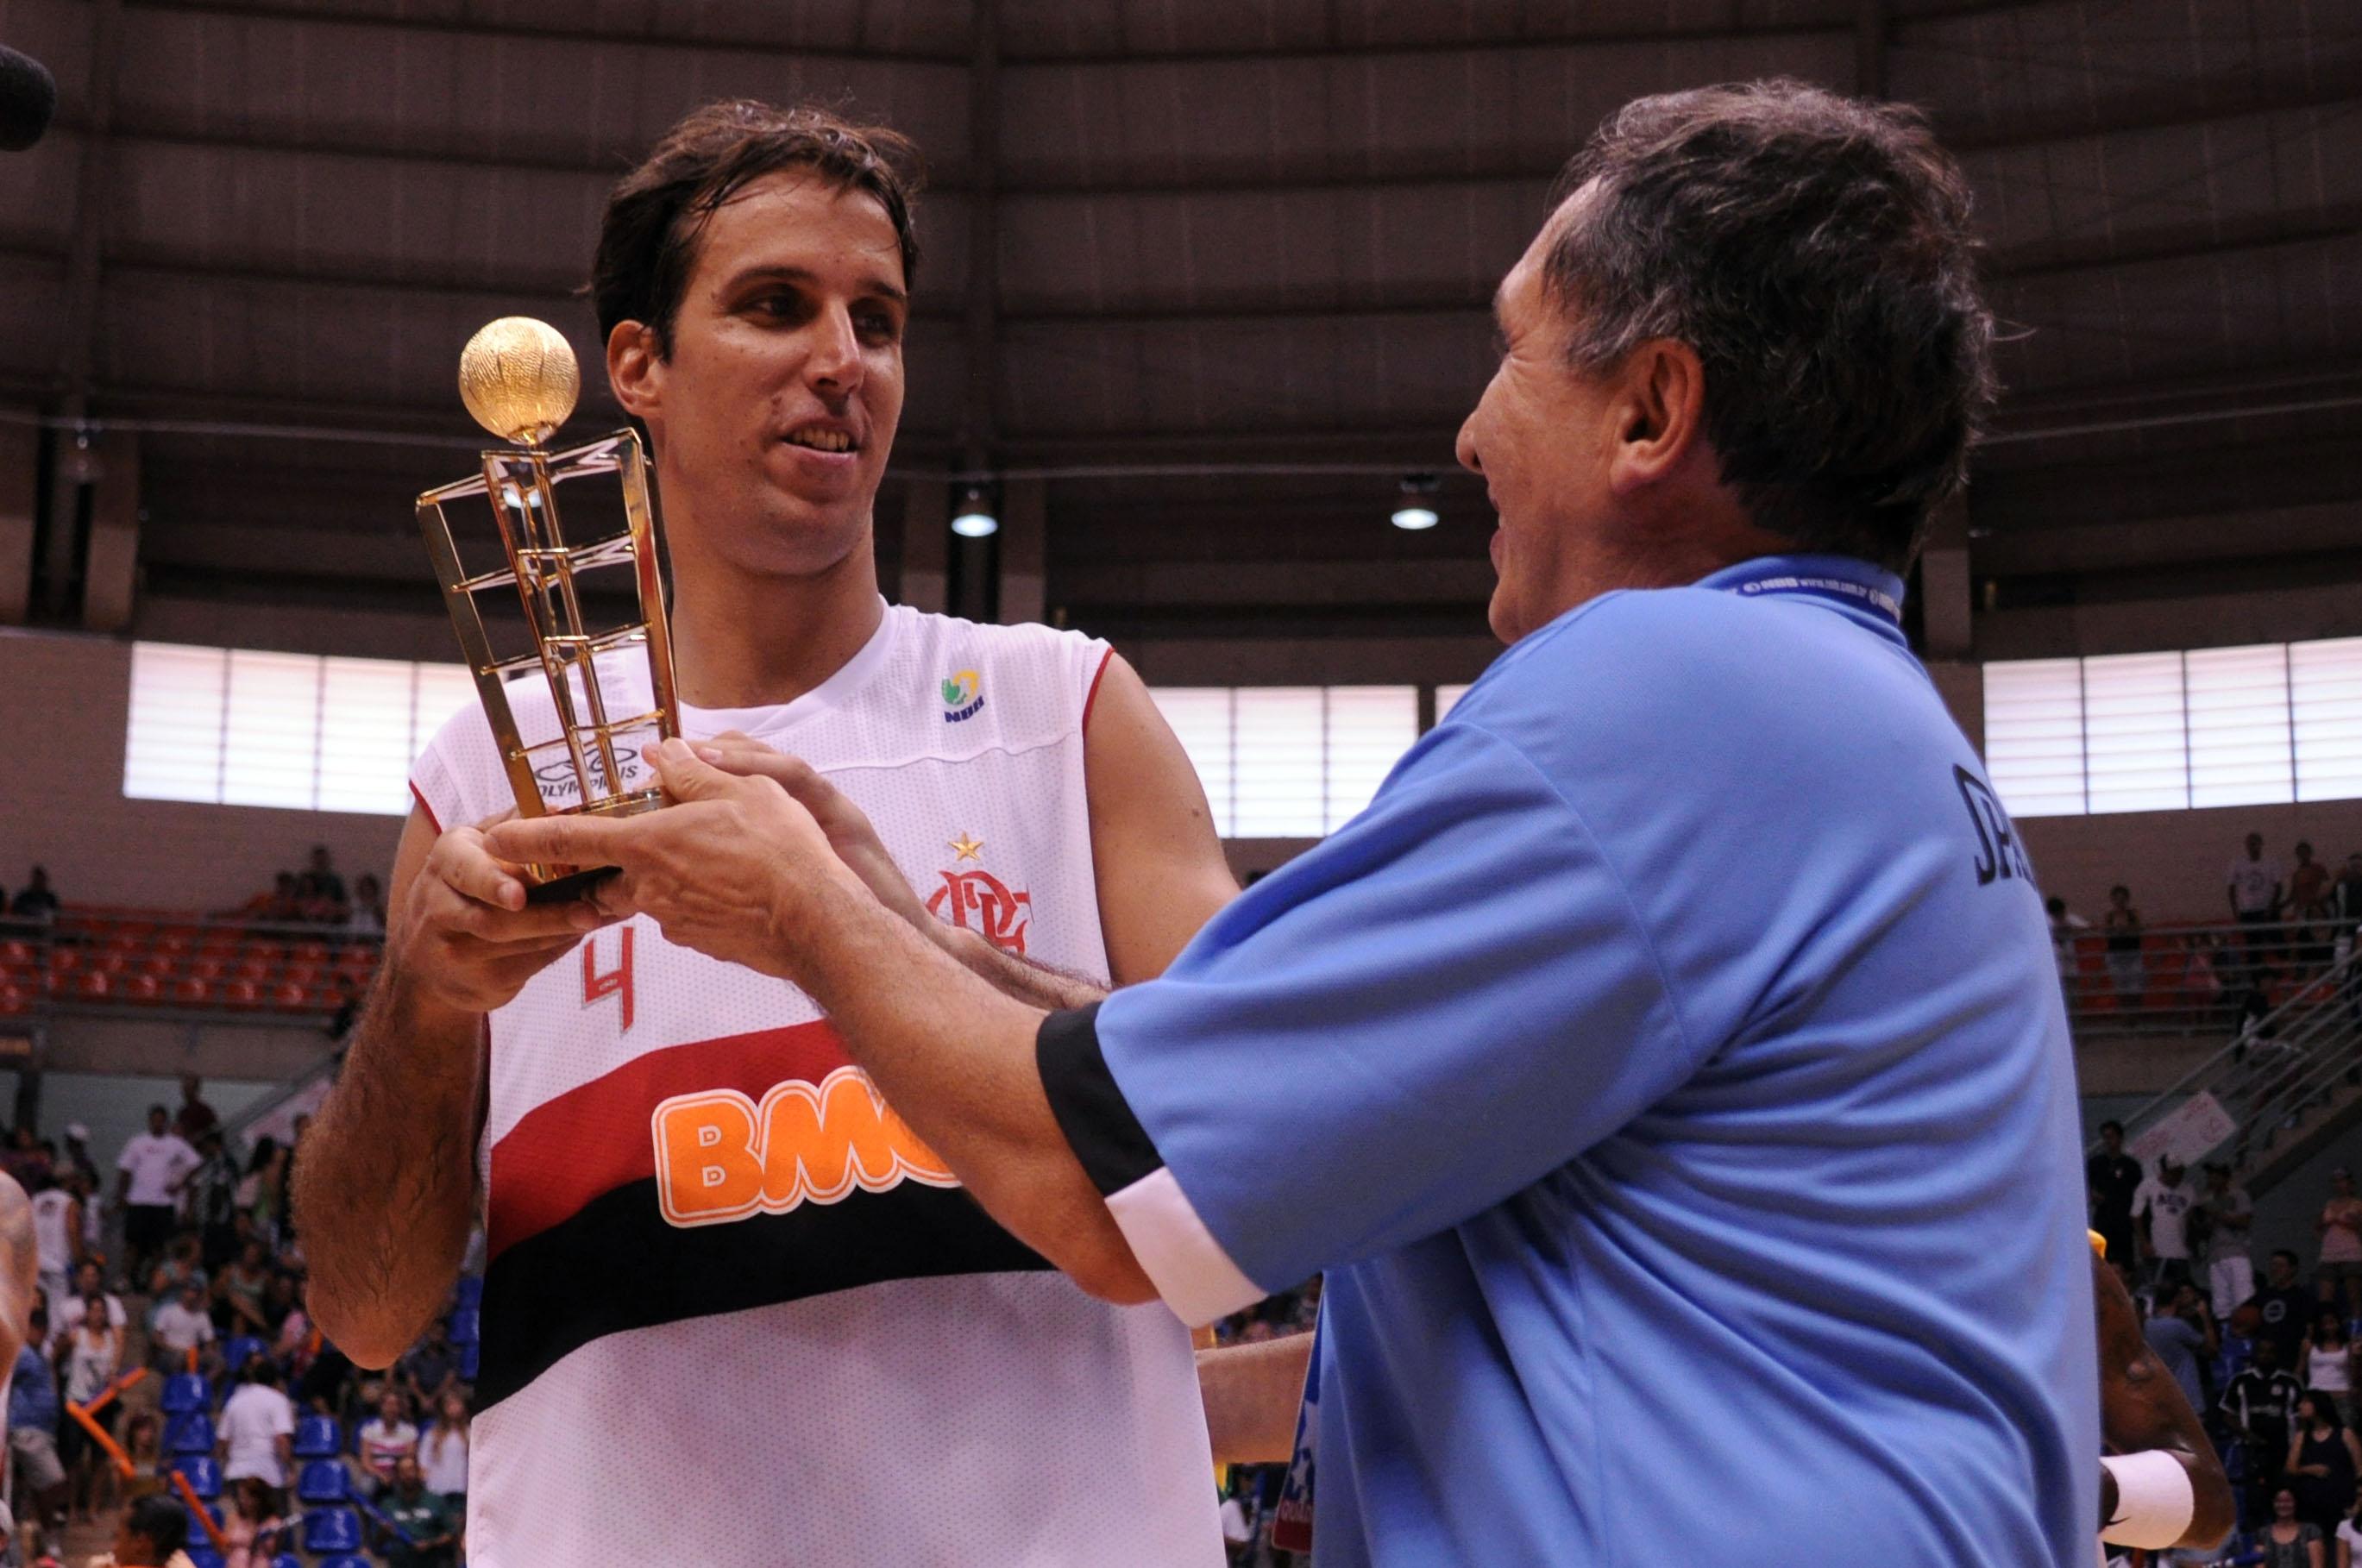 MVP - Marcelinho, do Flamengo, e Kouros Monadjemi